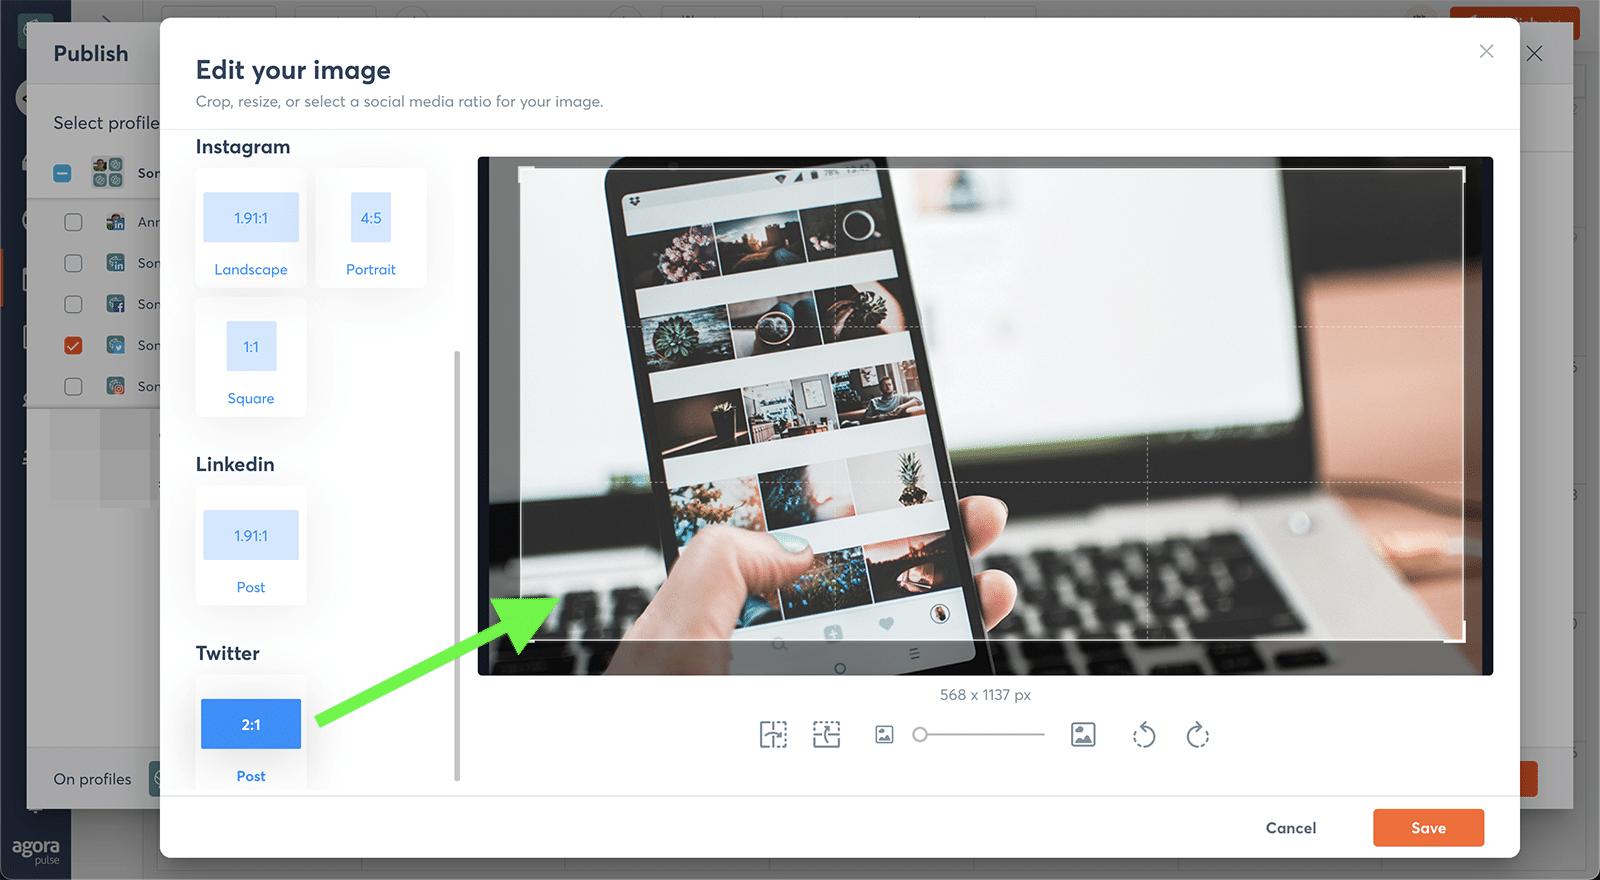 agorapulse image editor